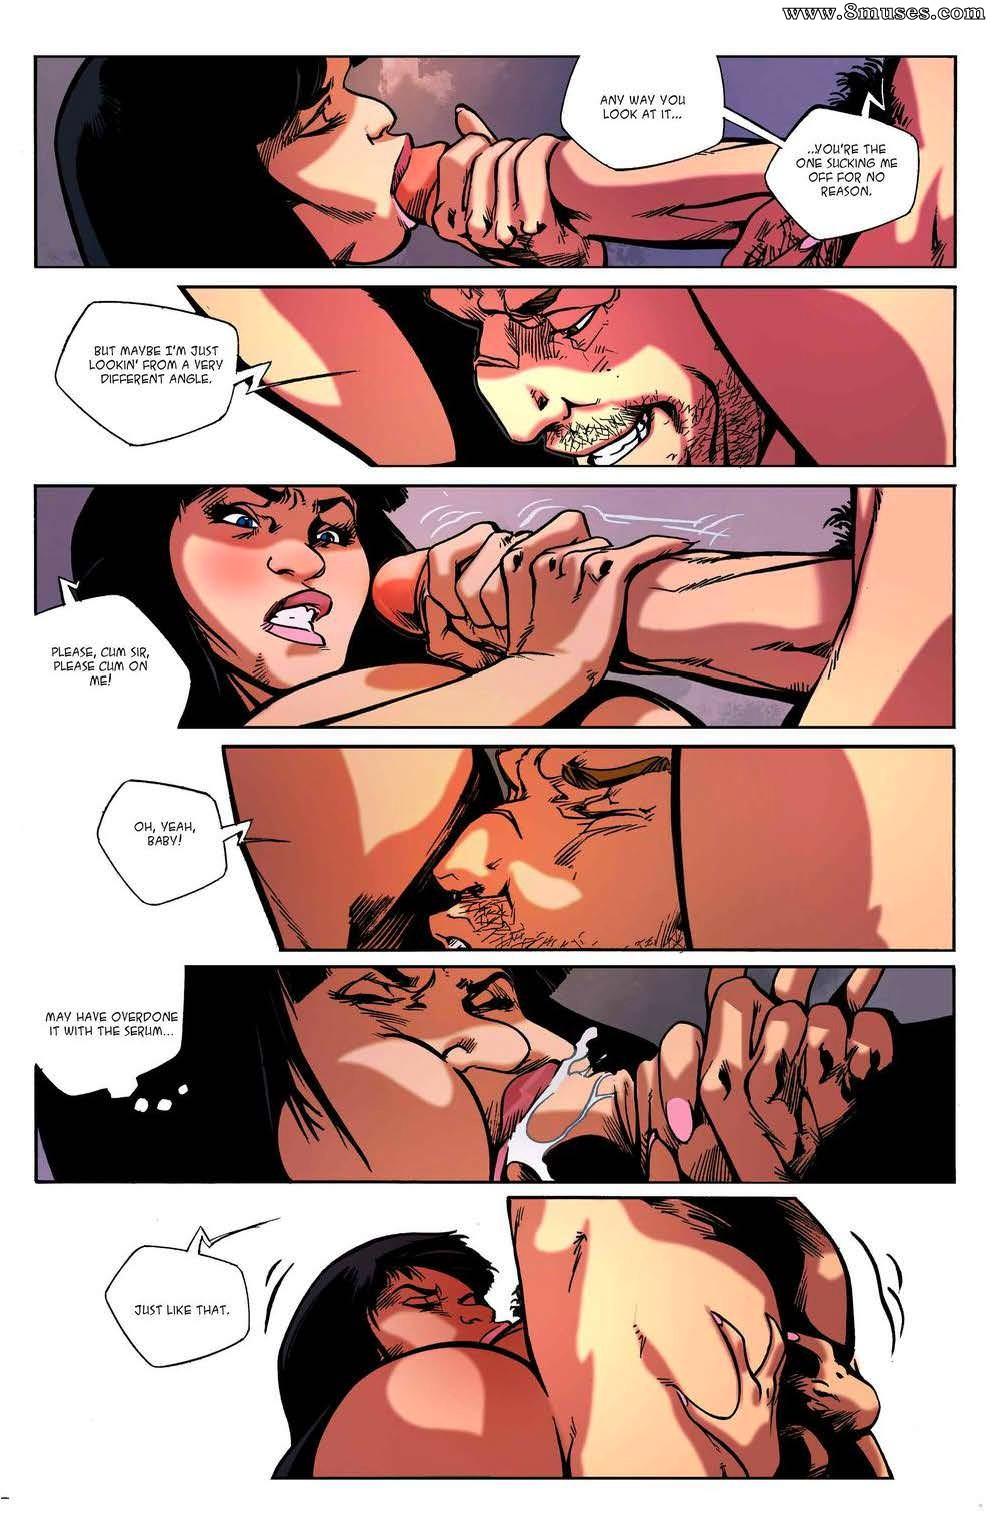 sehr dirty xxx comics strip